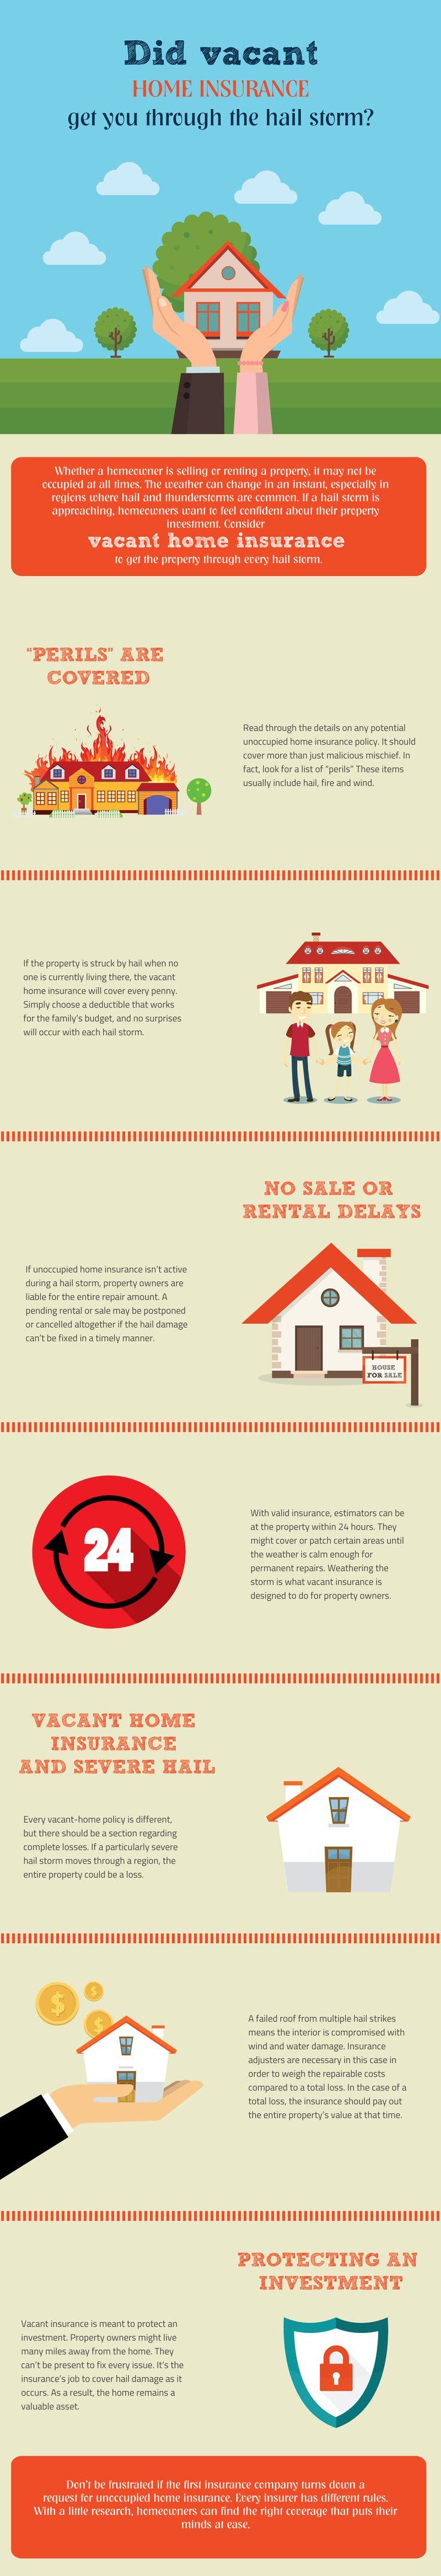 Reasons payday loan denied image 9